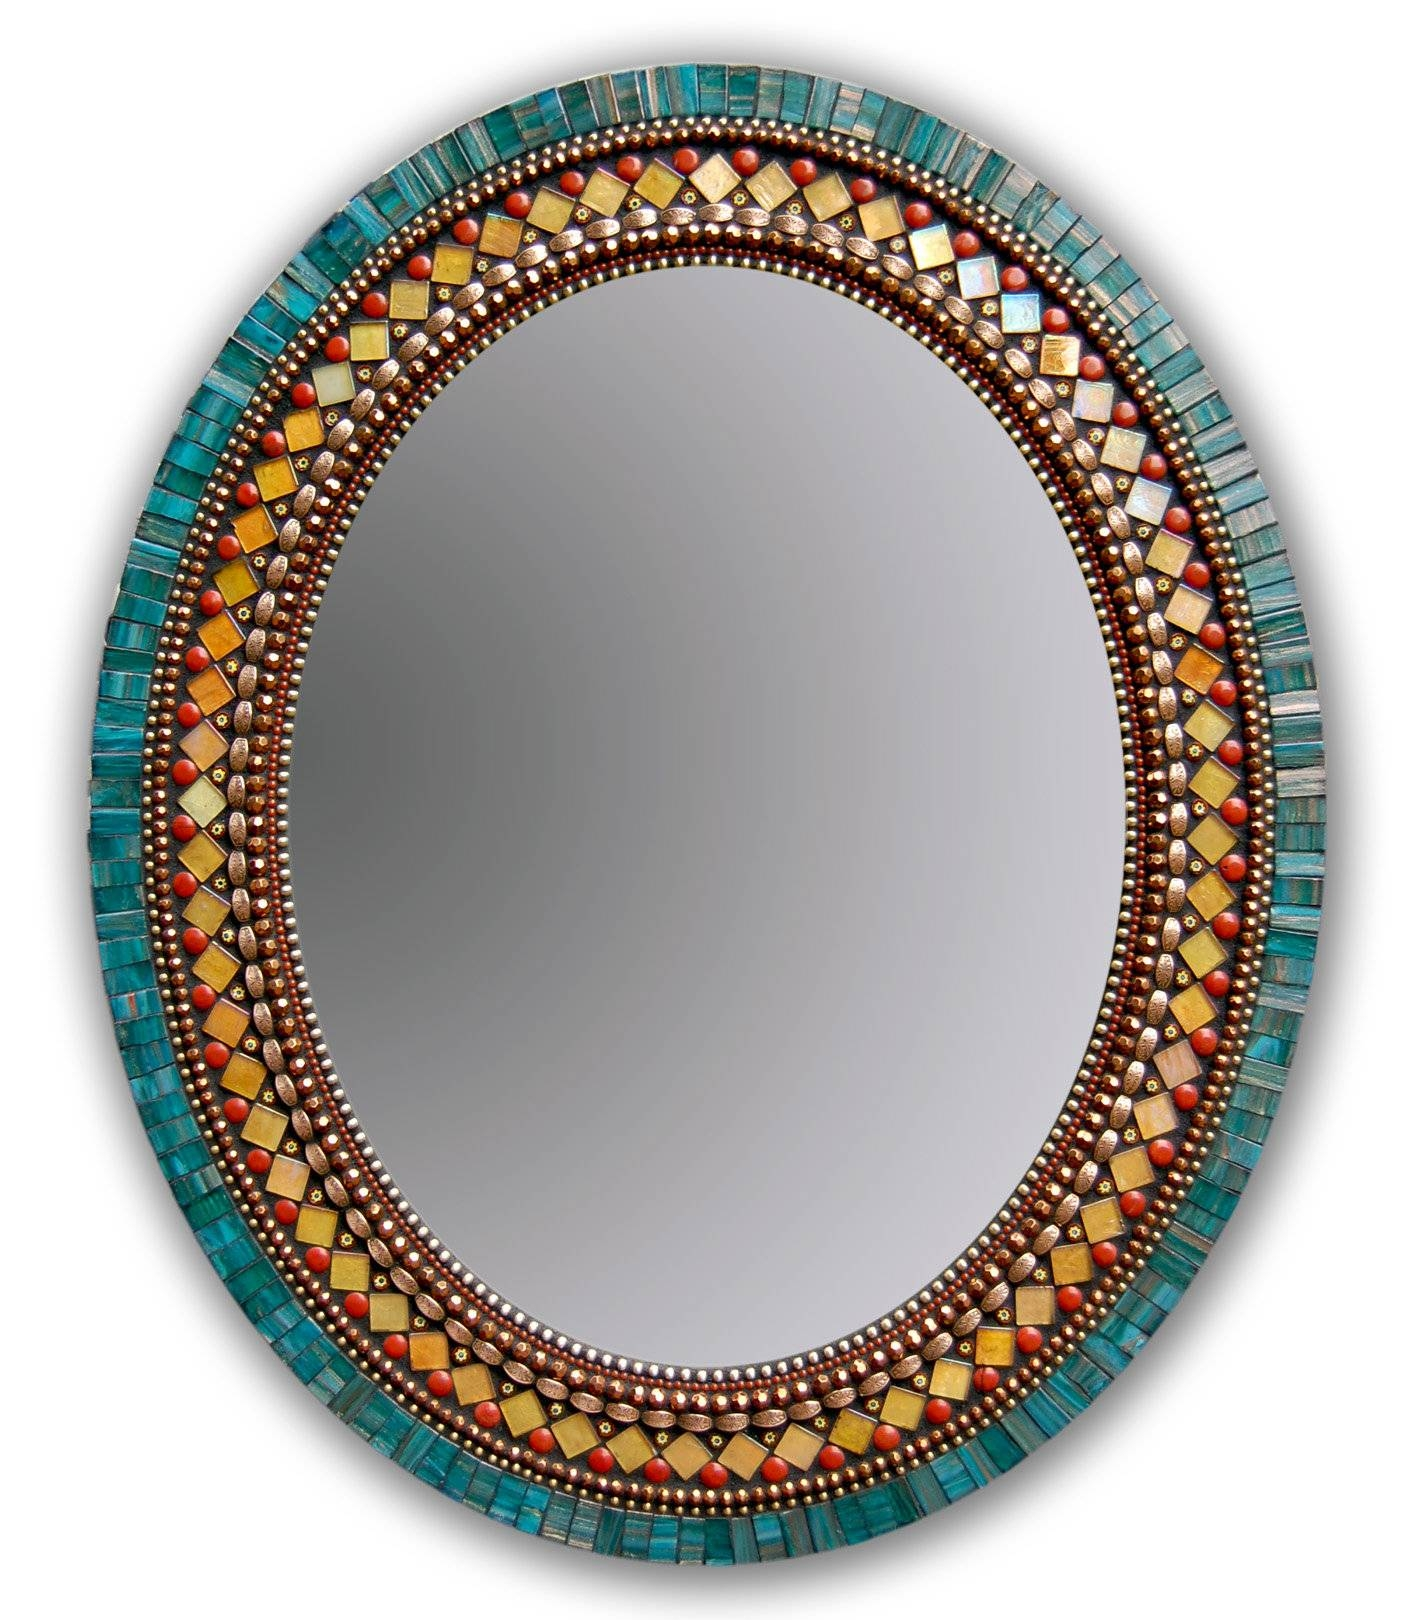 Butterfly Mirrorangie Heinrich (Mosaic Mirror) | Artful Home regarding Large Mosaic Mirrors (Image 2 of 15)